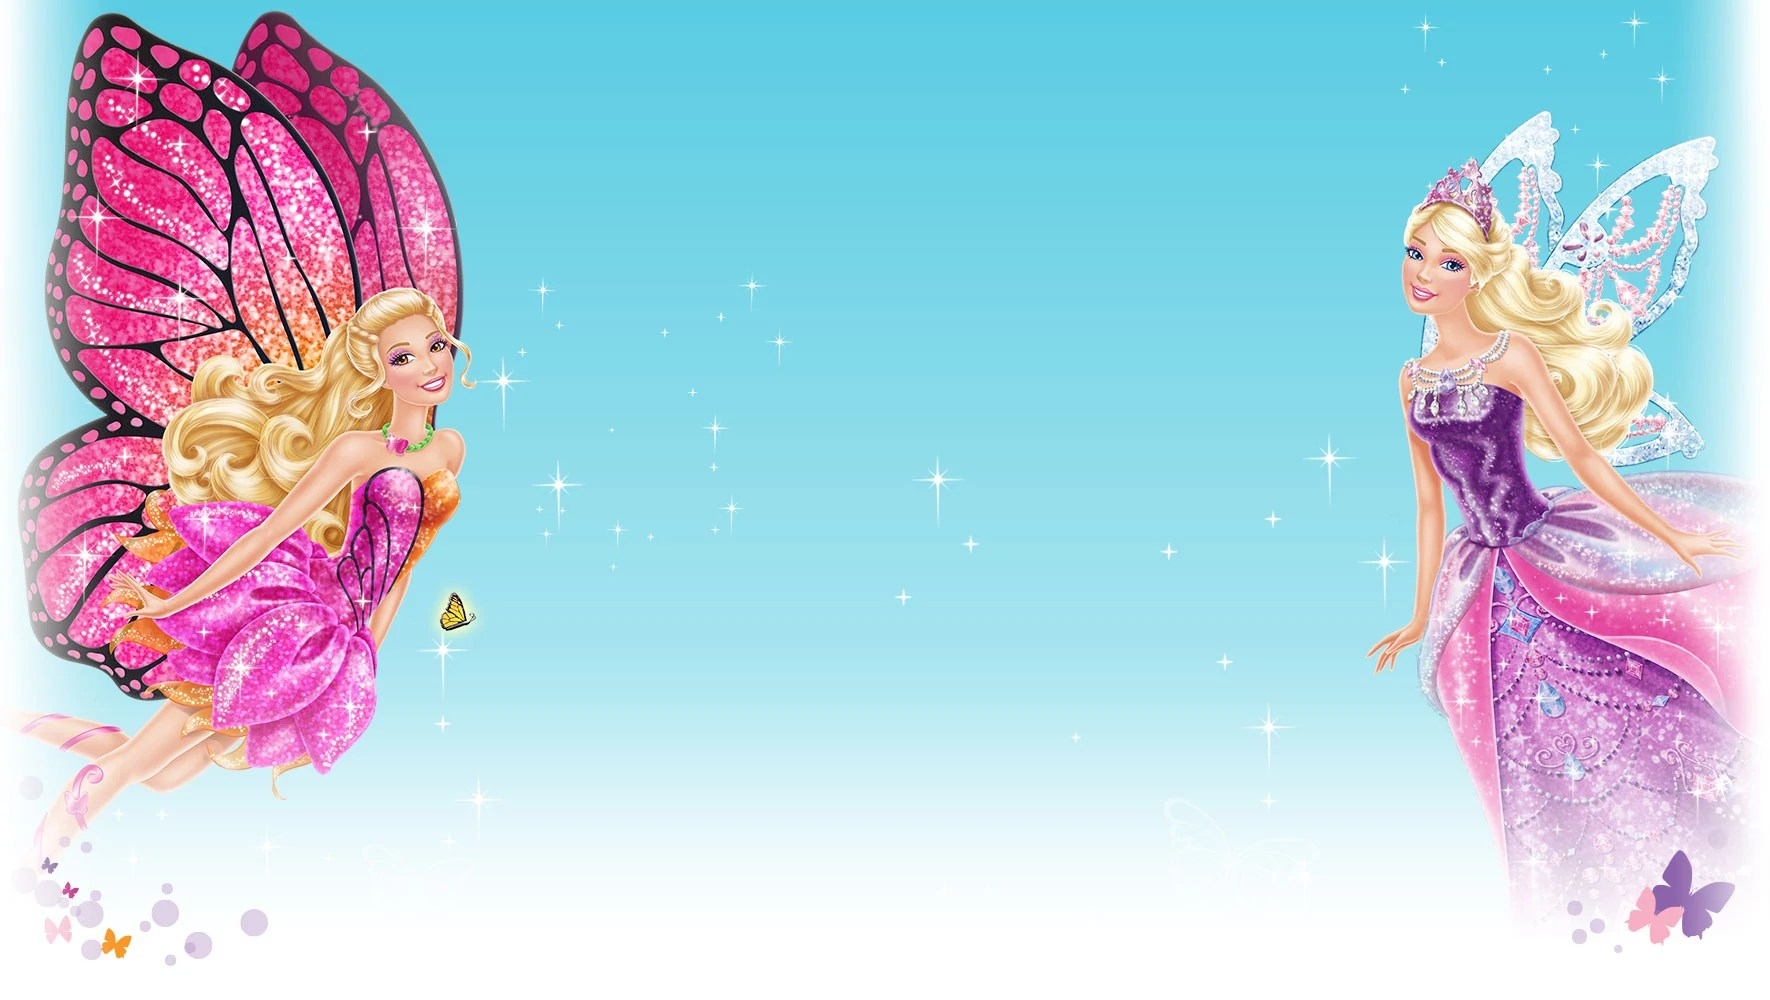 Cute Pari Doll Wallpapers Image Barbie Mariposa The Fairy Princess Barbie Movies